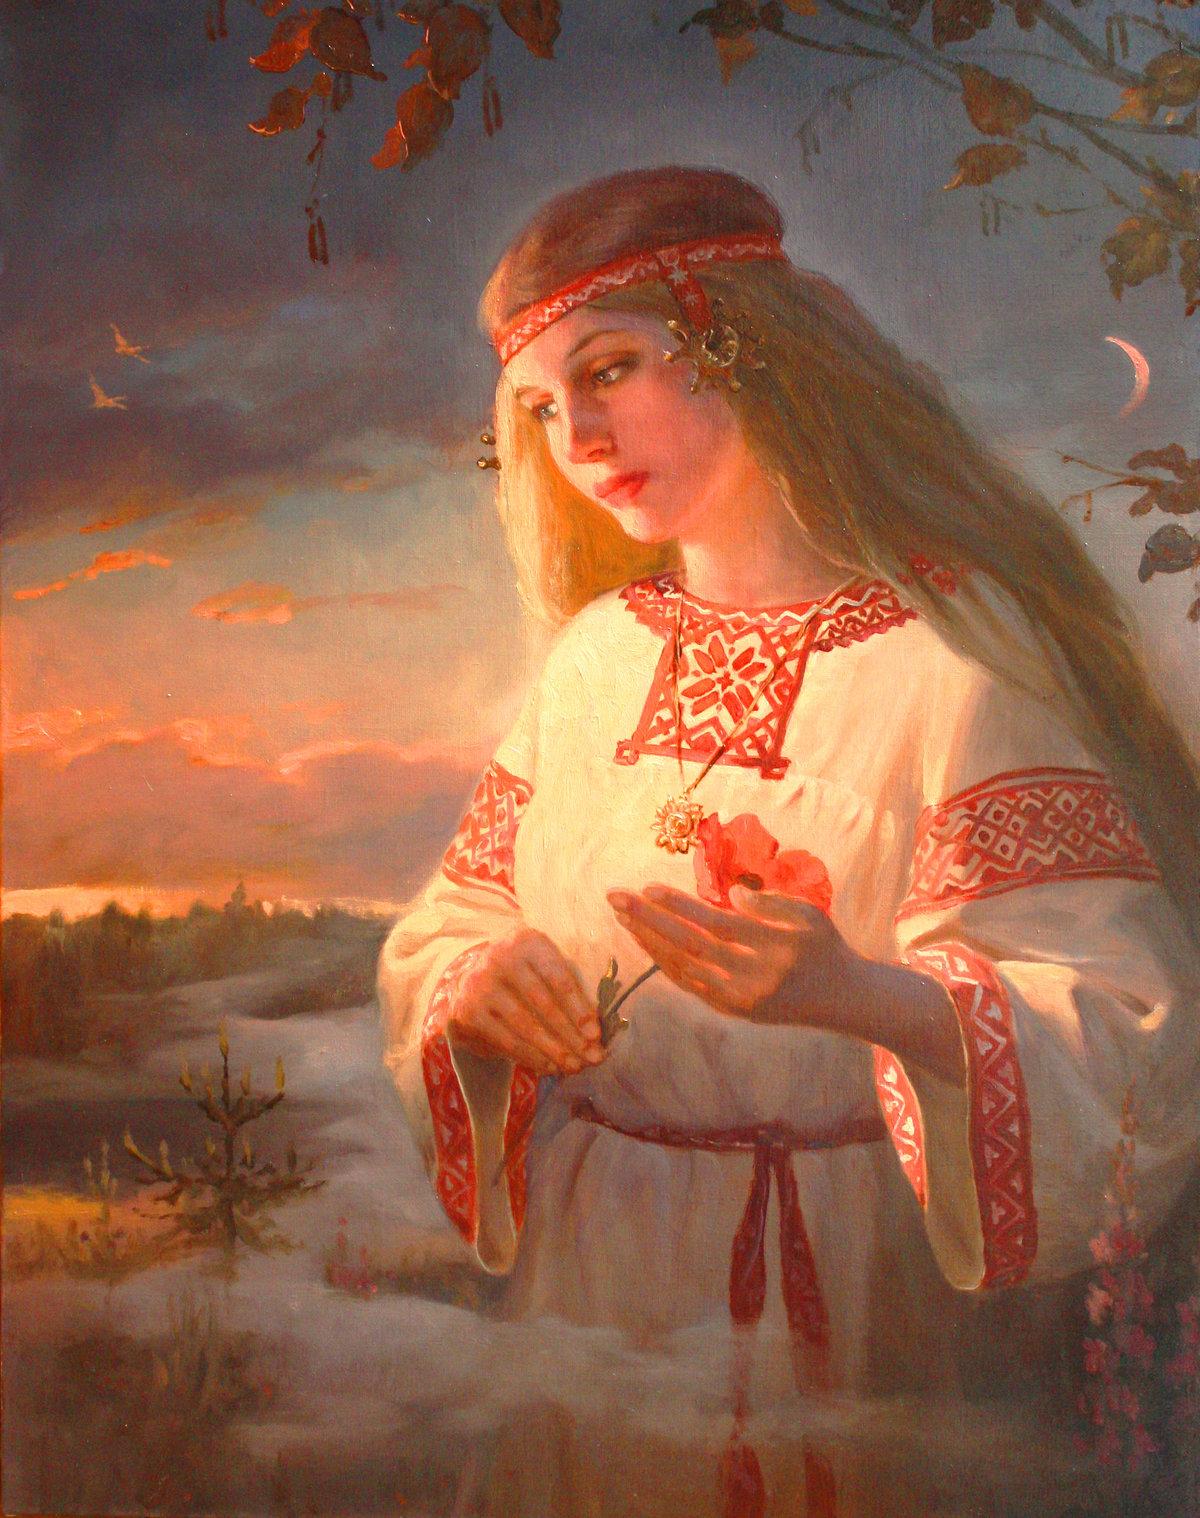 Зубик, картинки славяне